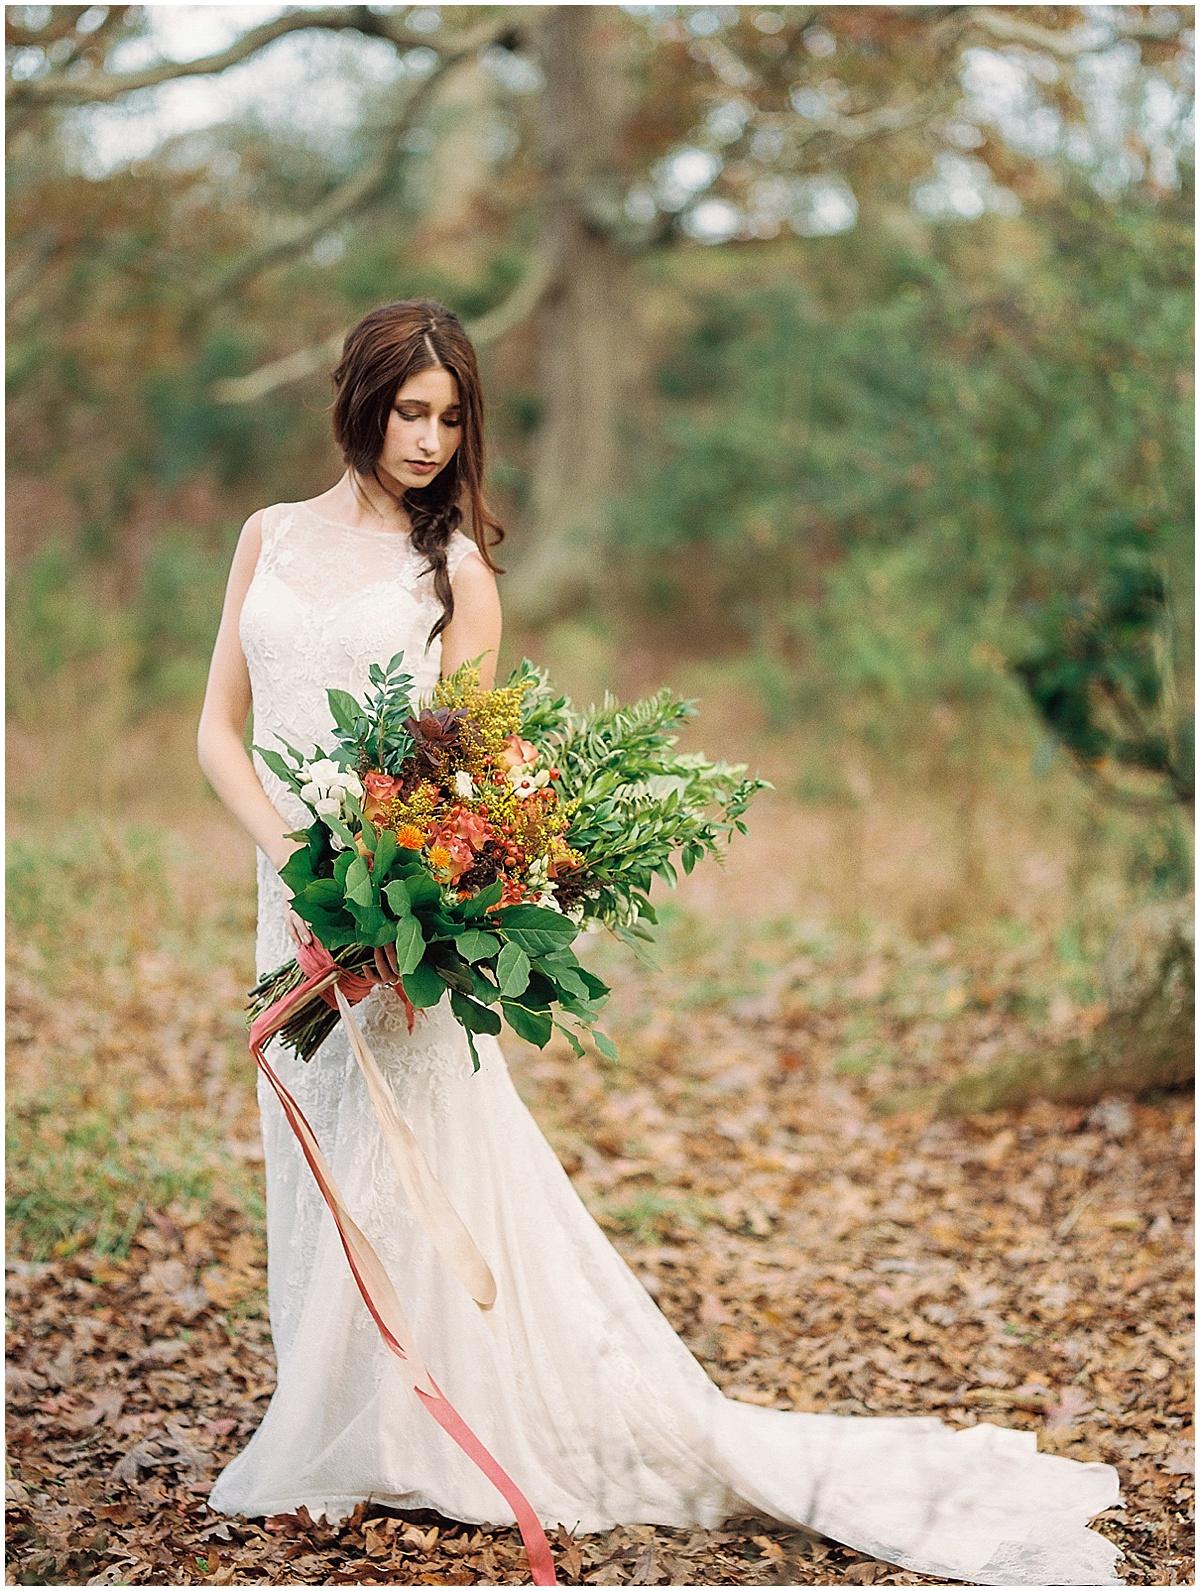 Abigail_Malone_Fall_Wedding_Knoxville_Film_Portra_400_Kodak_Mountain_Views_Abby_Elizabeth-49.jpg